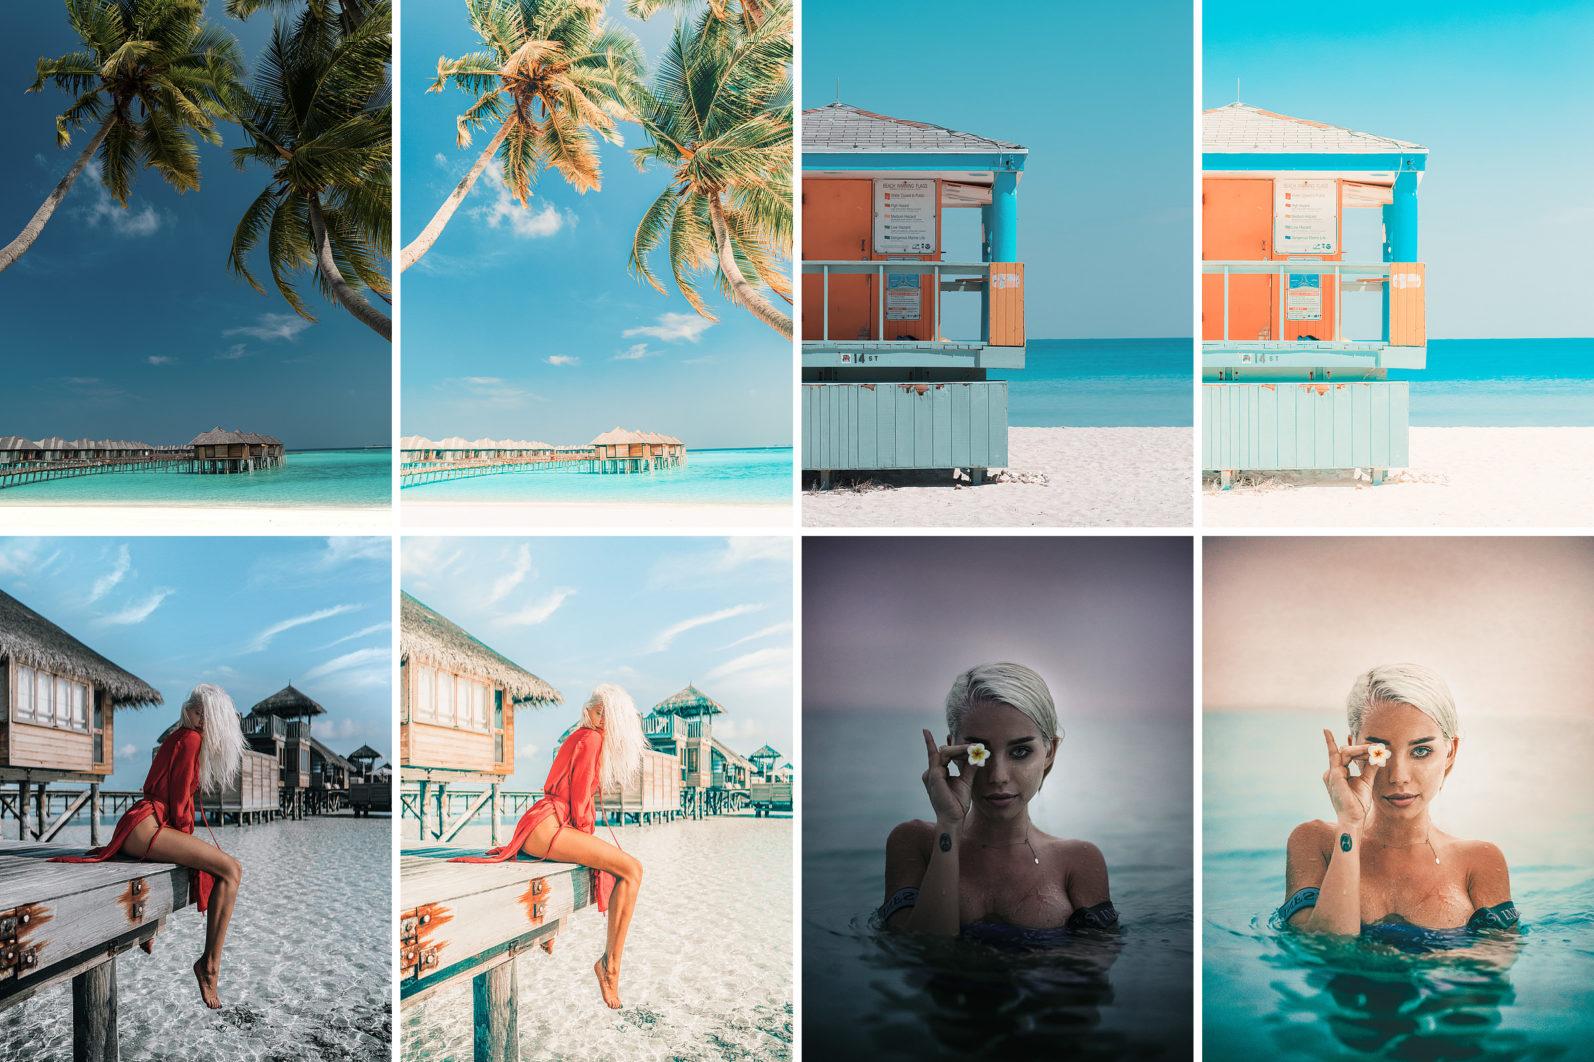 27. Beach Vacation Presets - 27.BEACHVACATIONS 4 -